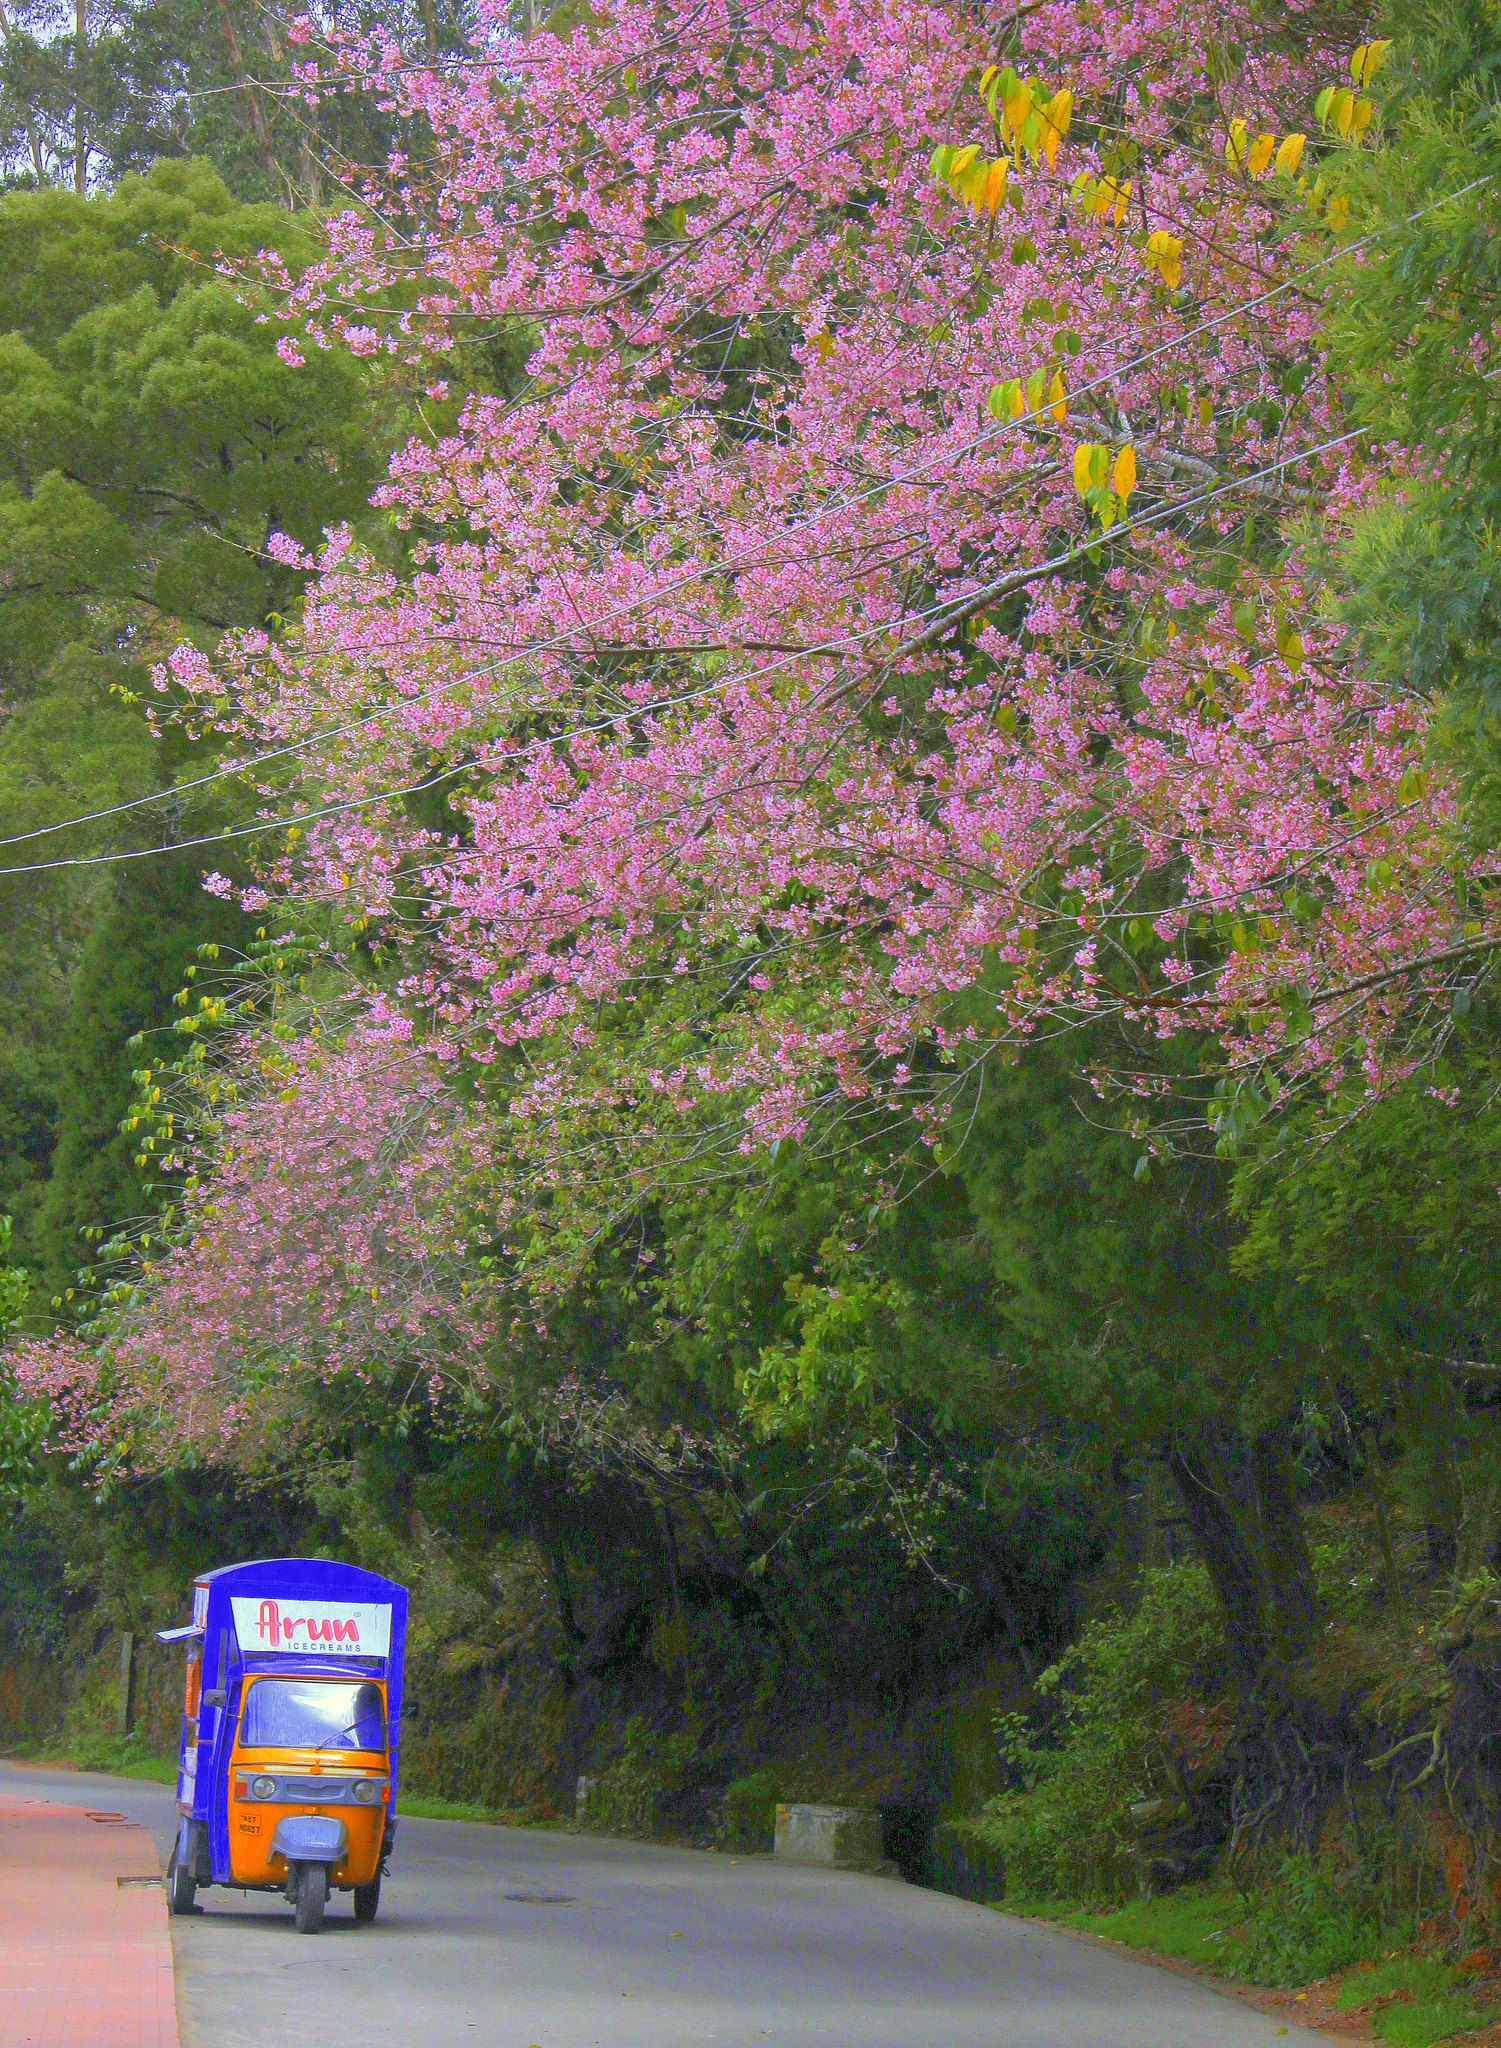 Kodaikanal in spring is full of flowers